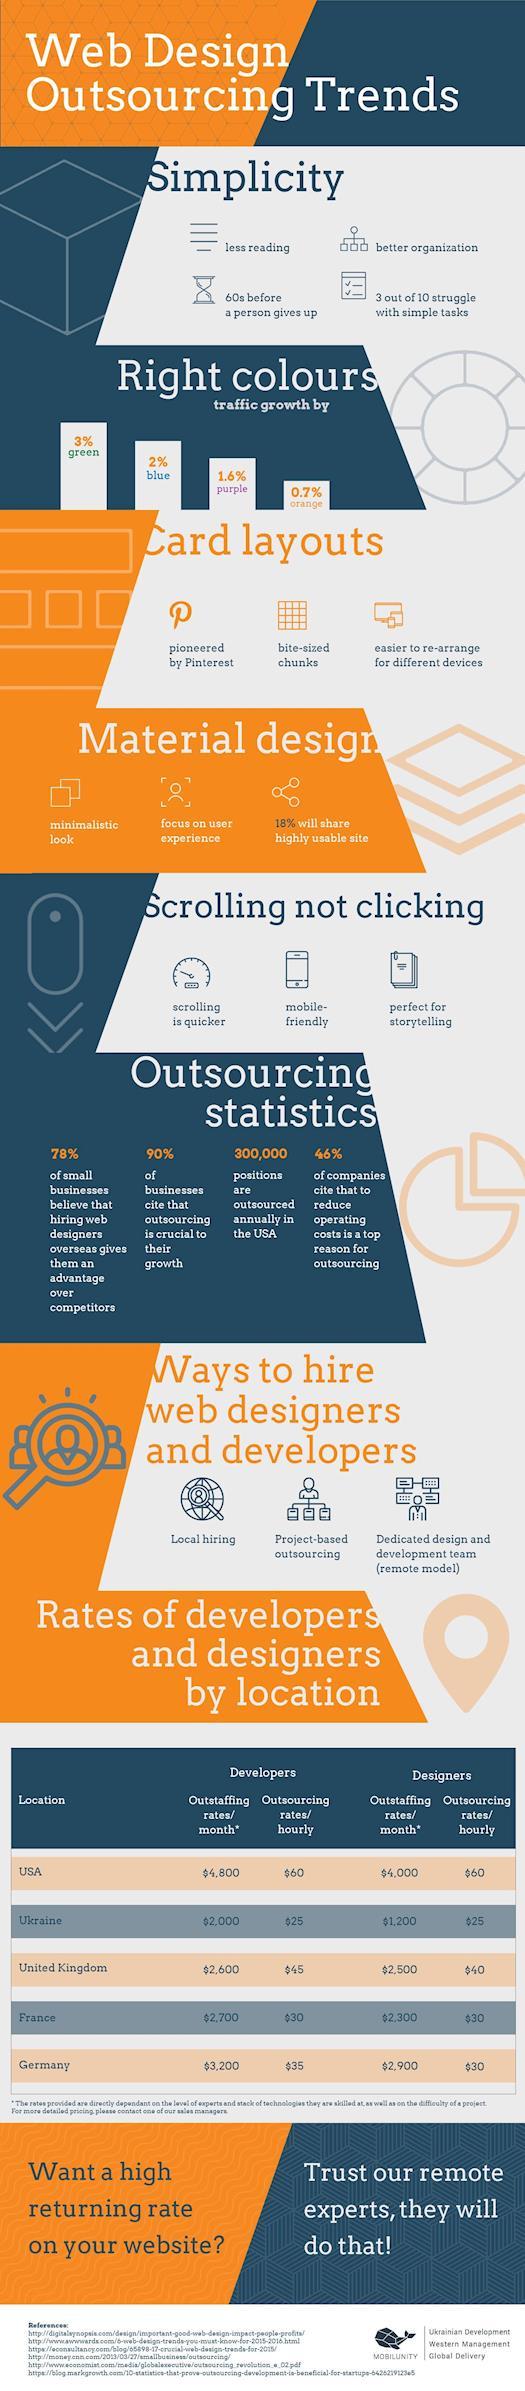 Top web design trends from web designers Ukraine